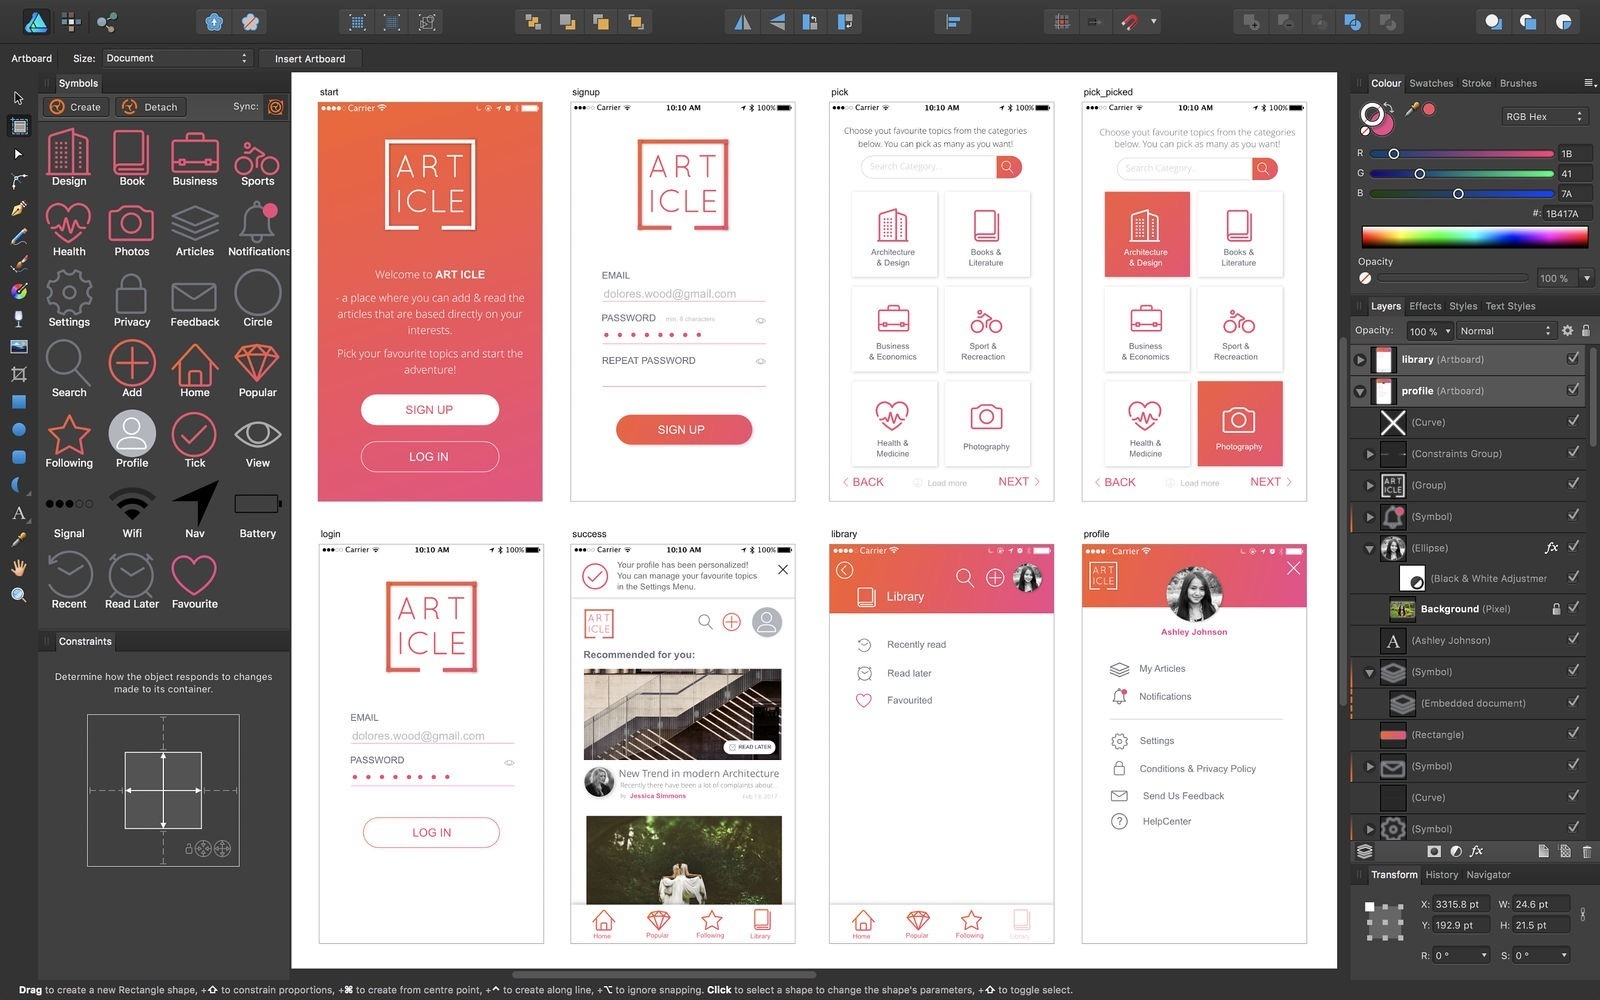 Affinity Designer 1.8.4 迅捷、流畅、精确的矢量图形设计工具-马克喵